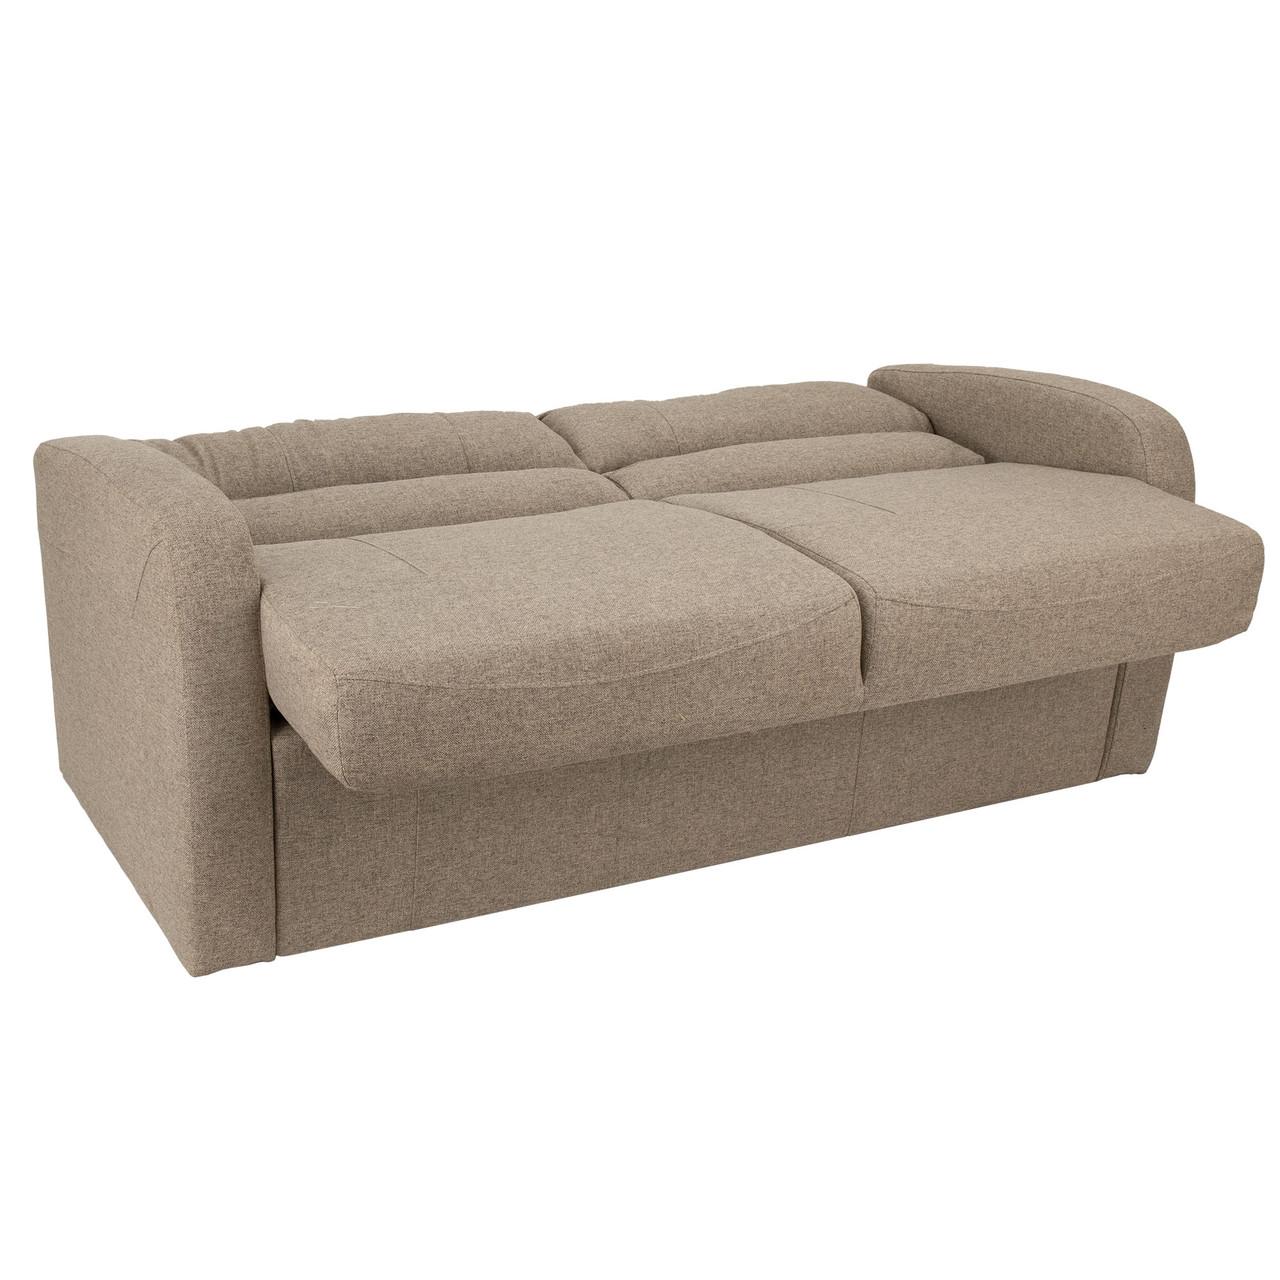 Terrific 70 Jack Knife Rv Sleeper Sofa Cloth Recpro Pdpeps Interior Chair Design Pdpepsorg